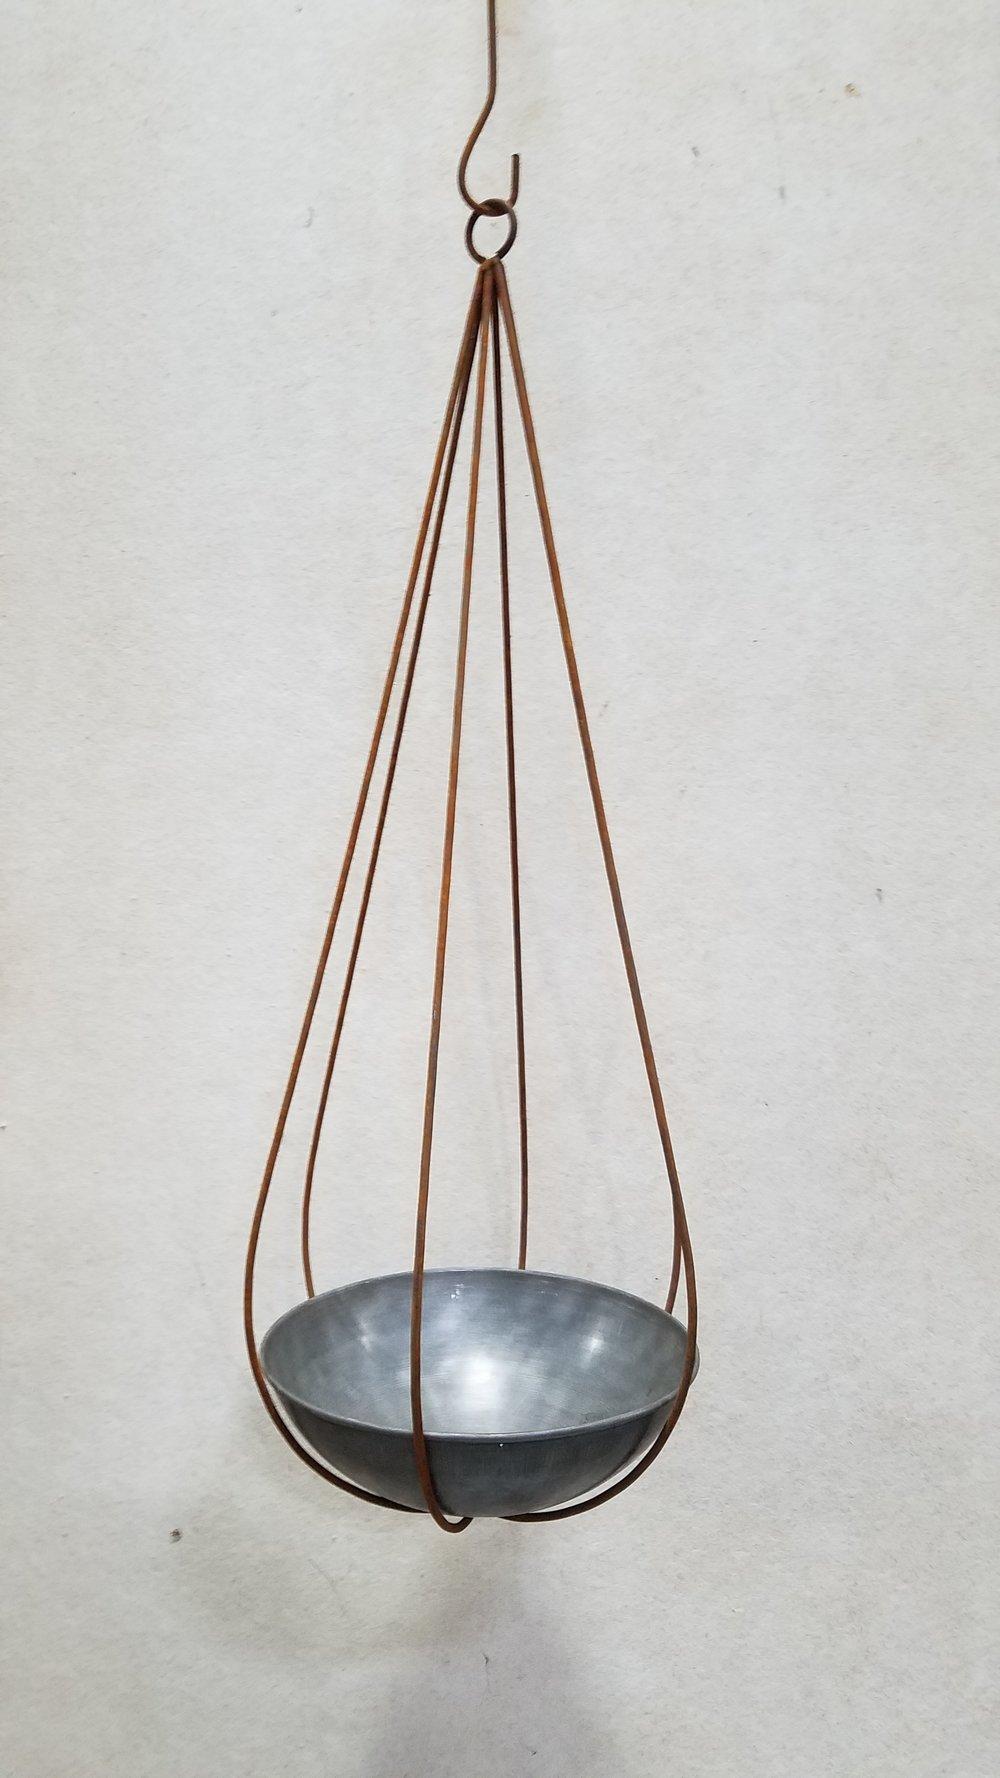 "Medium Slender Drop (MSD) 42"" Tall x 14"" Wide; Pictured with Wok Planter 14""-Mild Steel (W14M)"